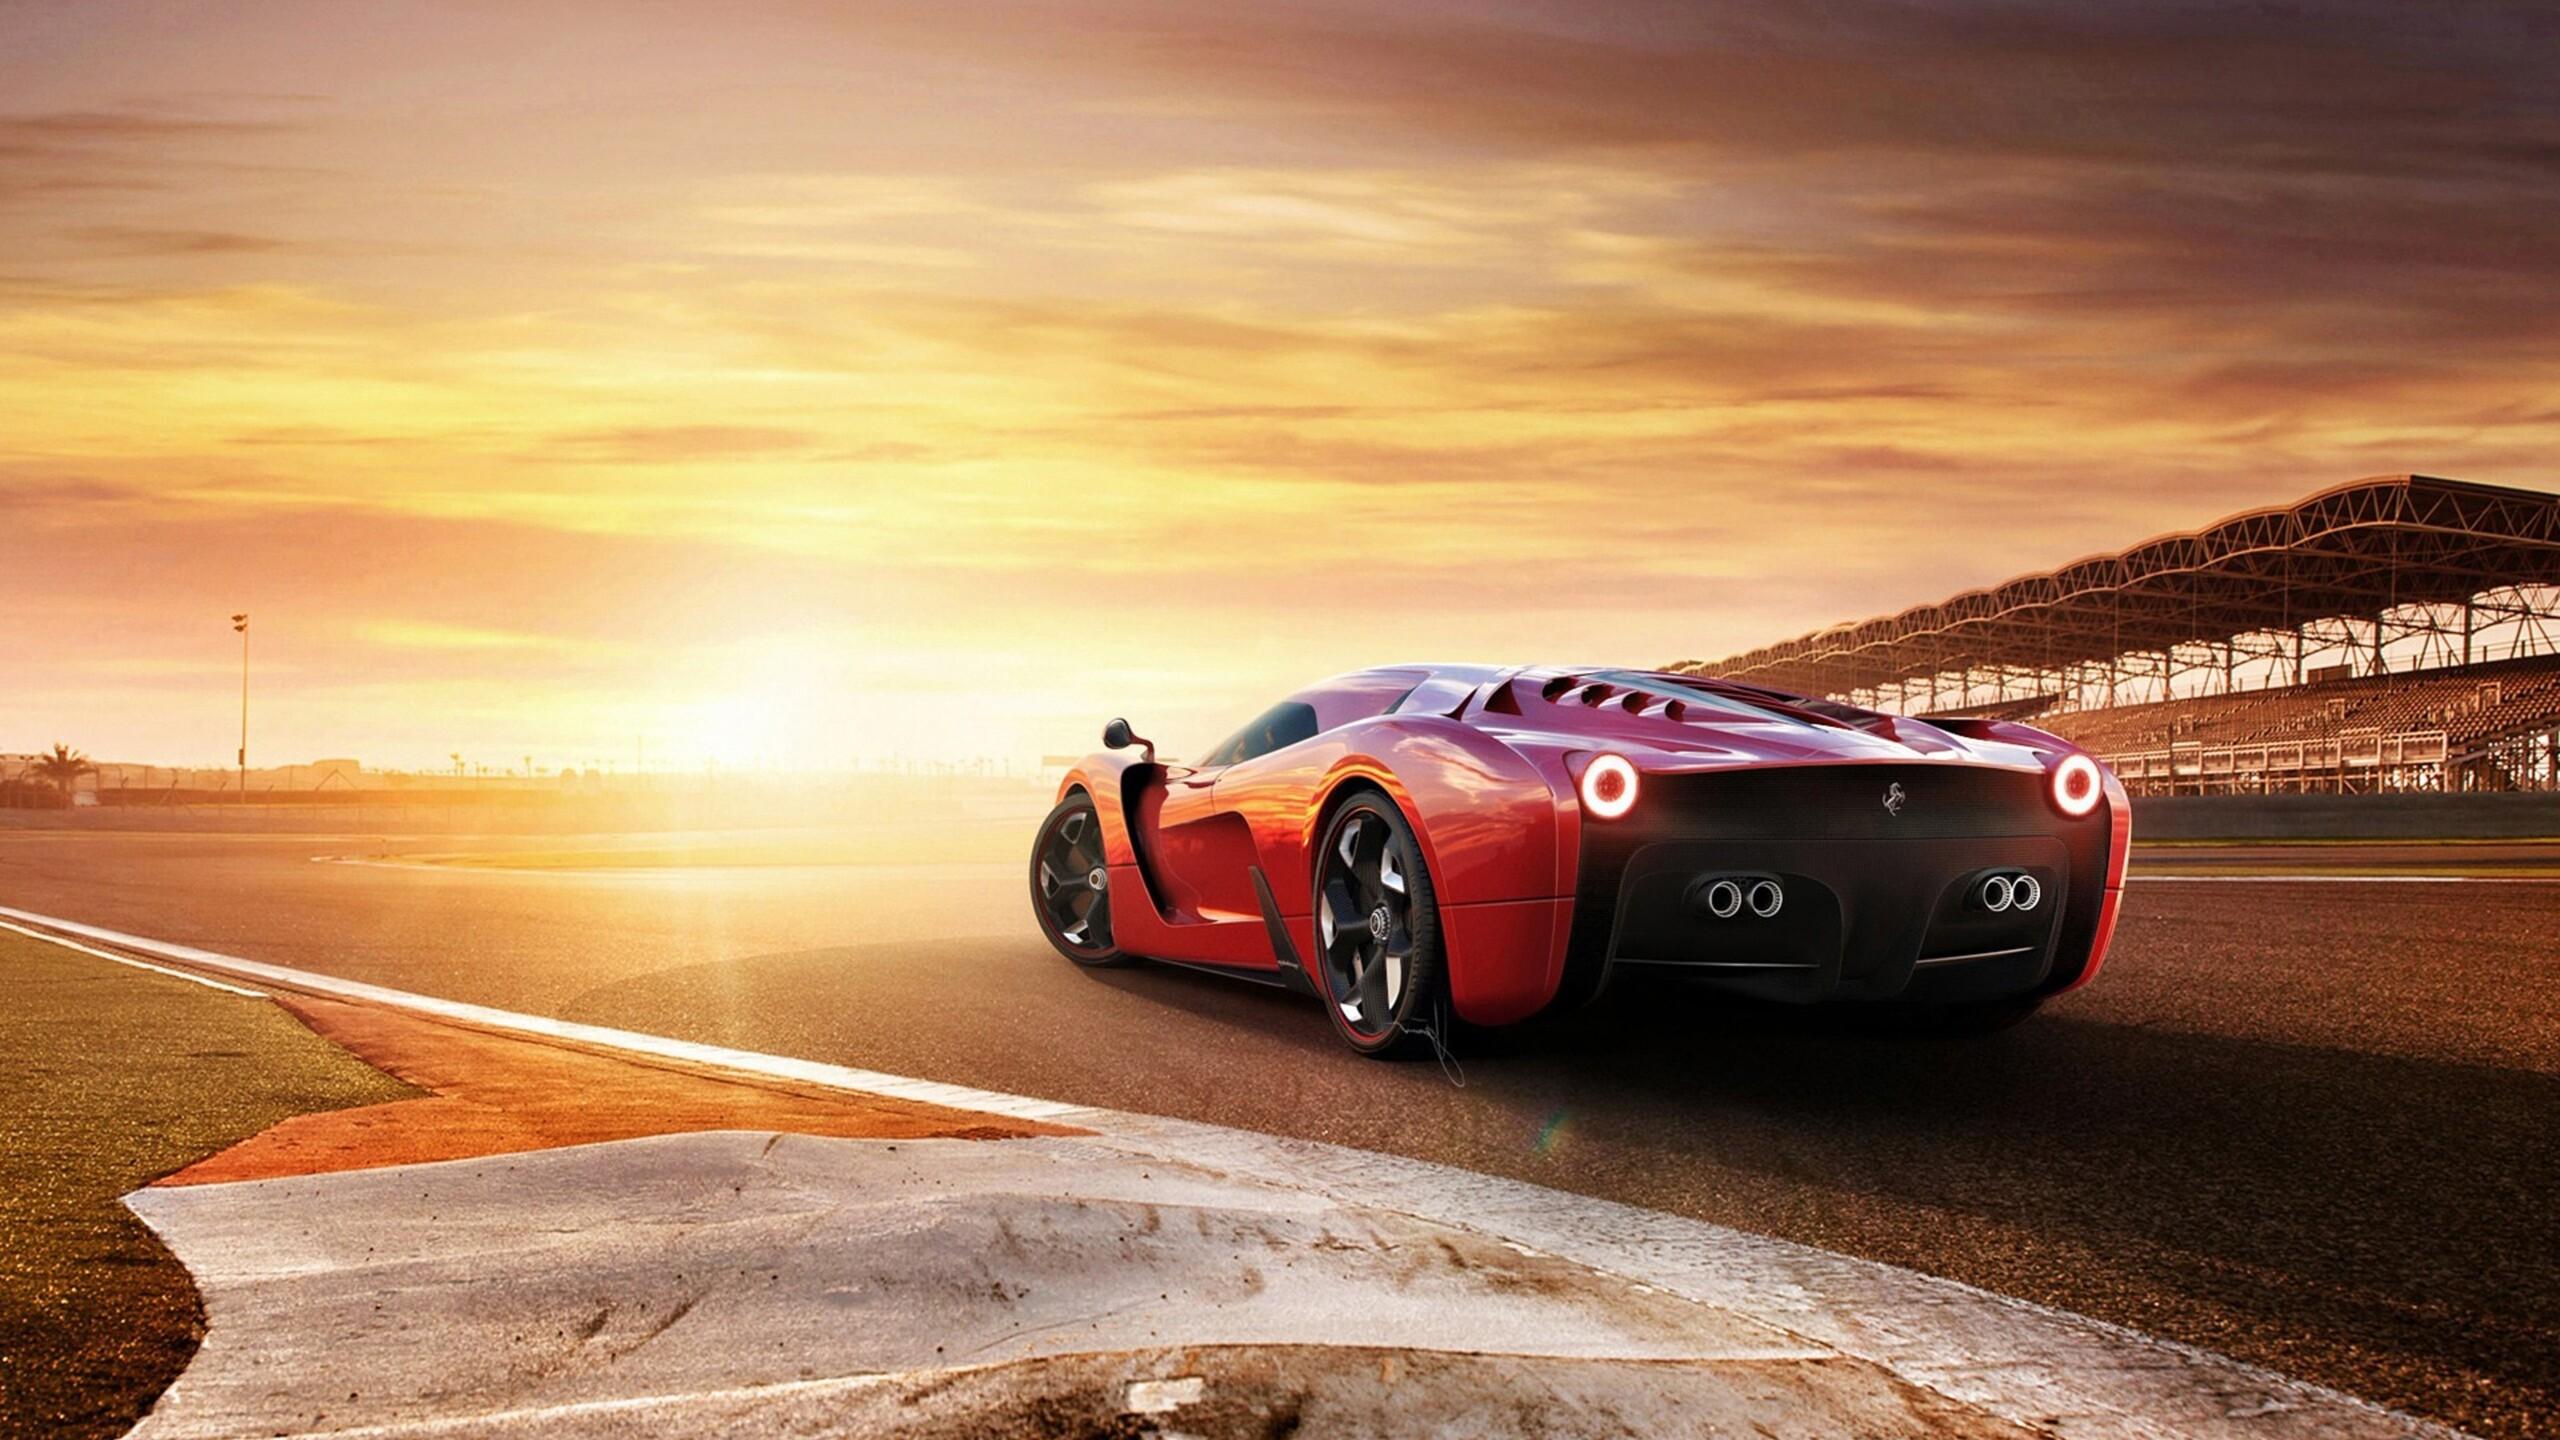 2560x1440 Ferrari 458 Concept Car 1440P Resolution HD 4k Wallpapers, Images, Backgrounds, Photos